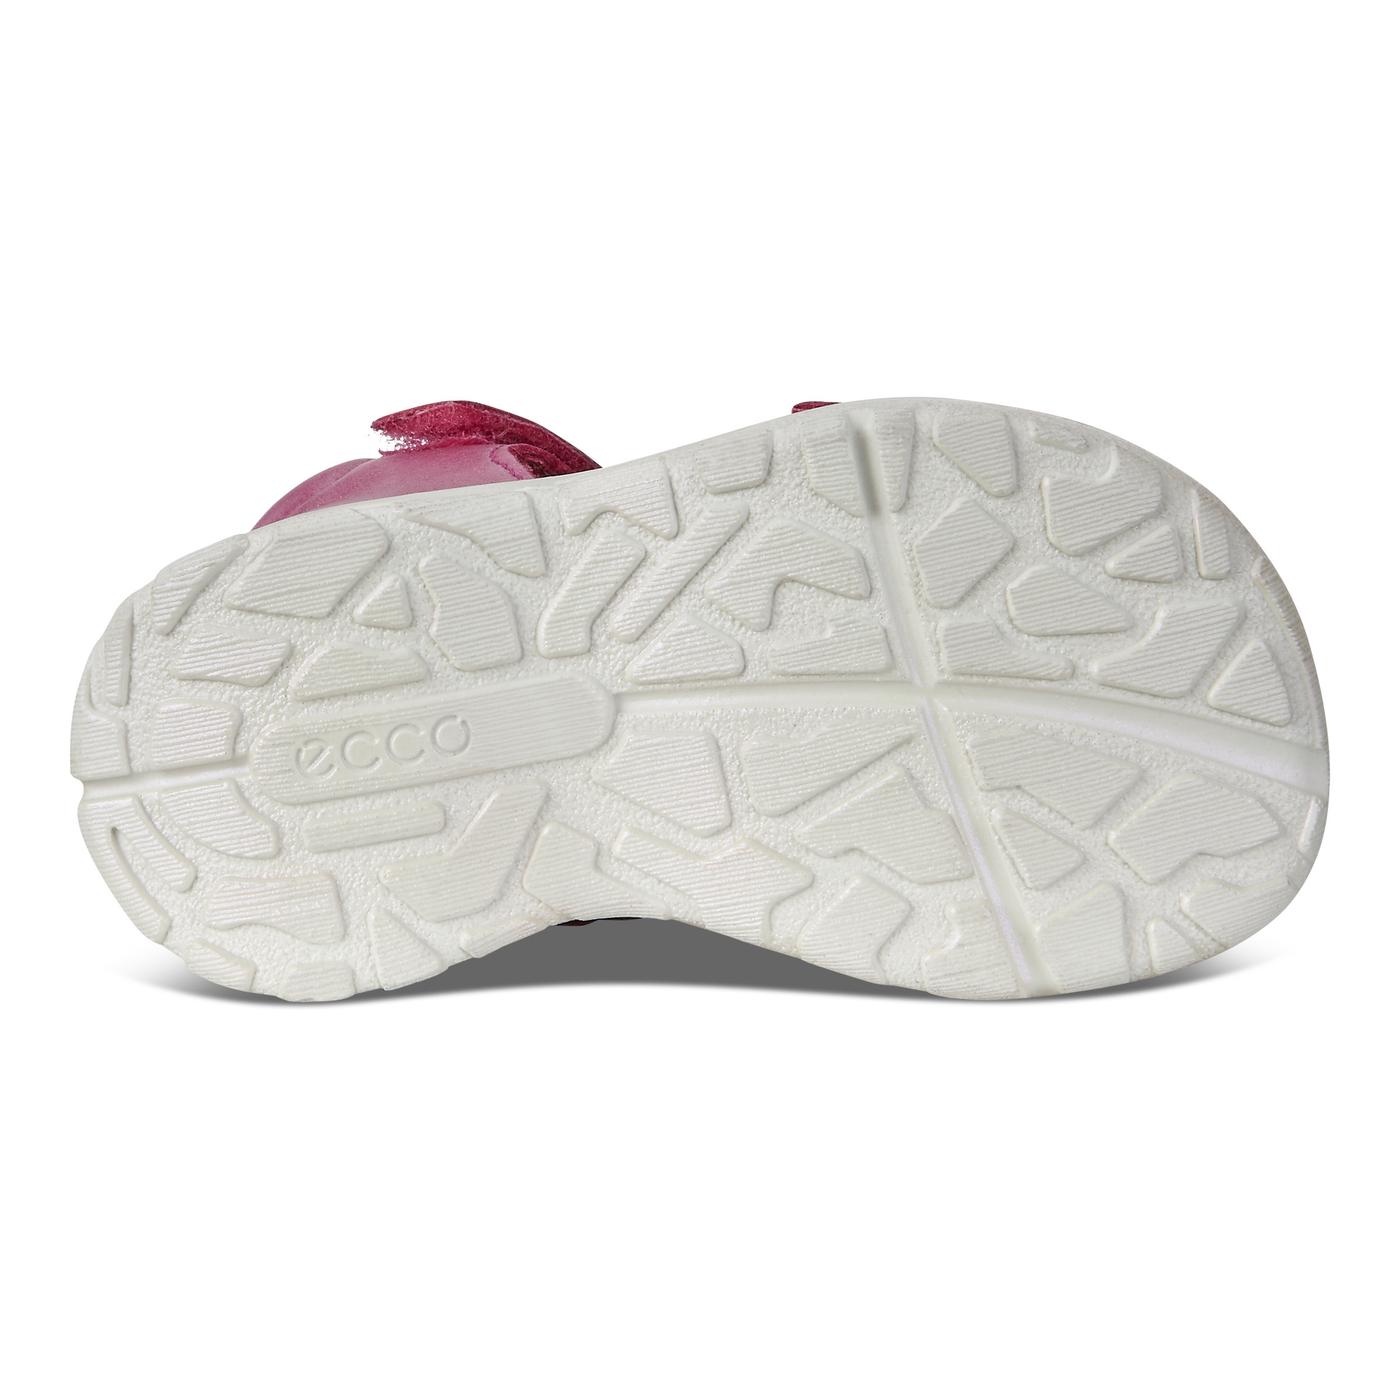 ECCO PEEKABOO Gladiator Sandal